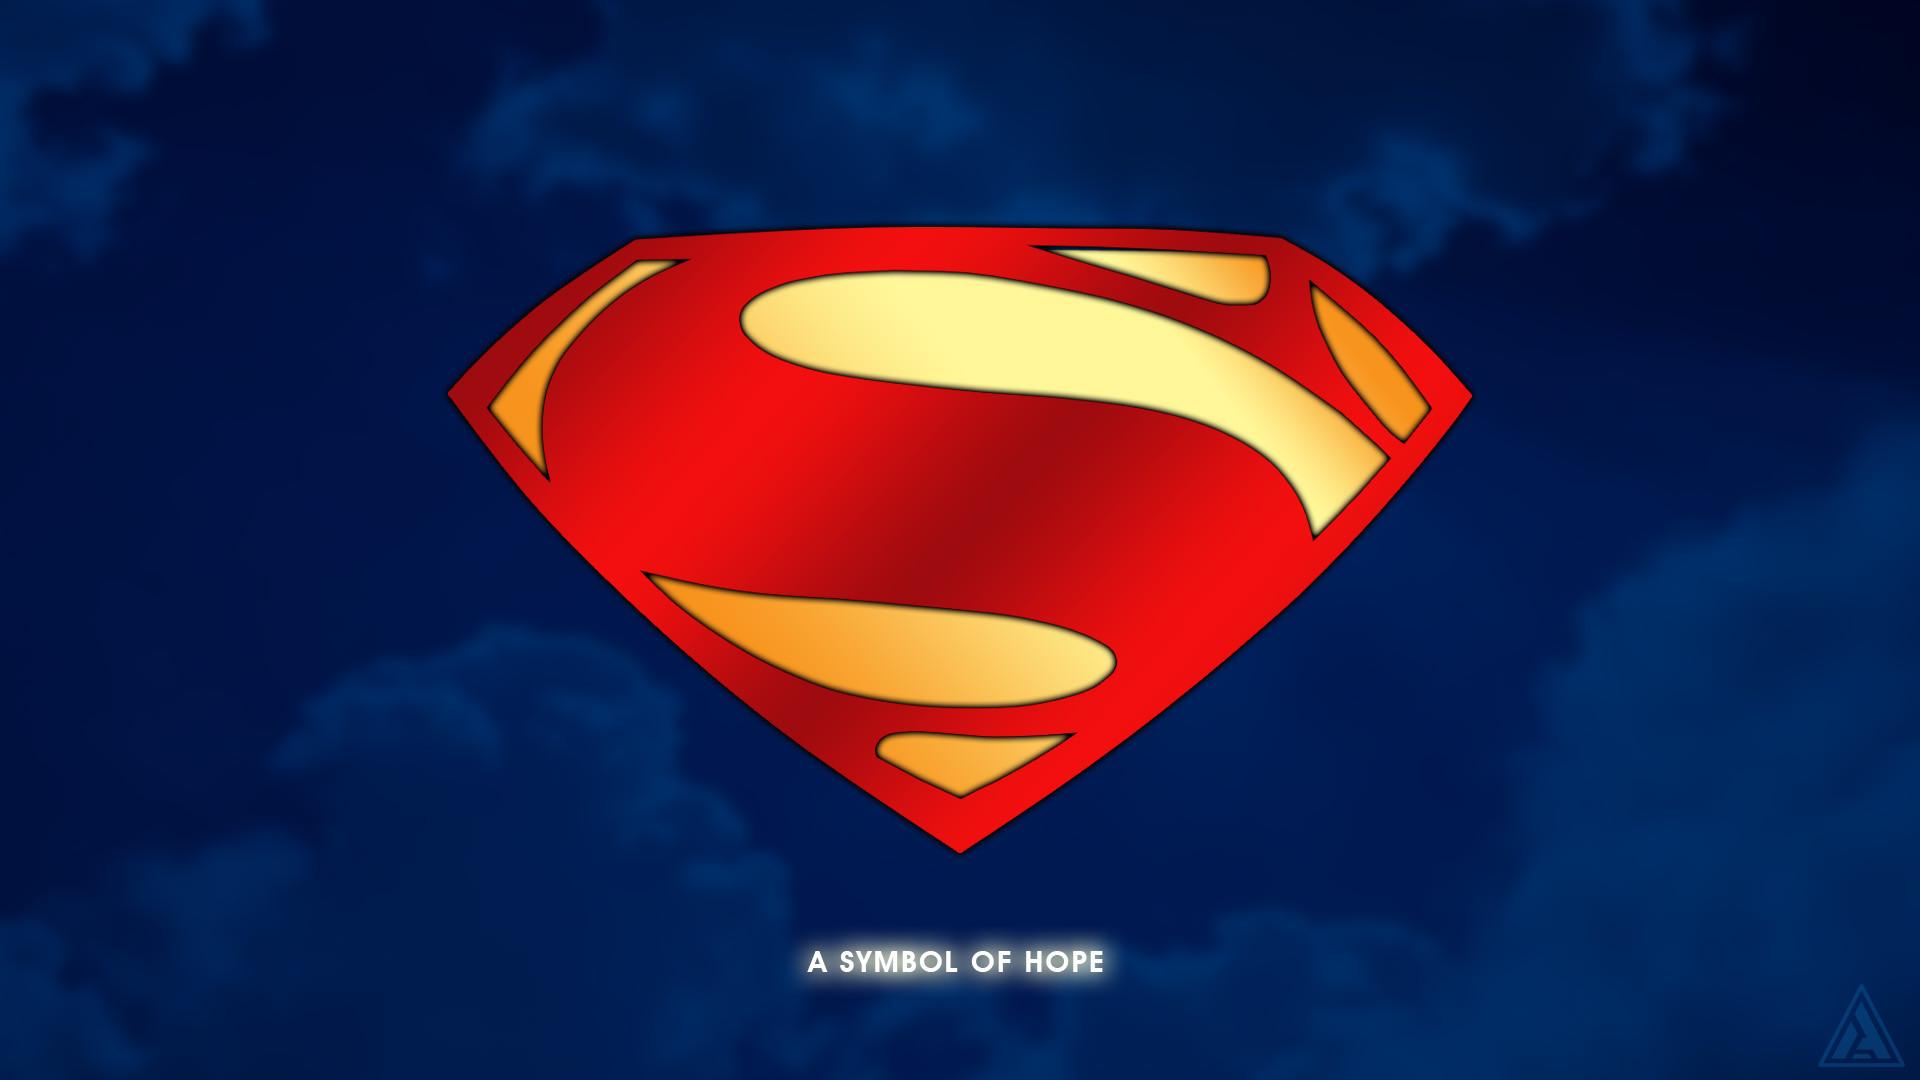 Updated Superman Shield/logo Wallpaper.